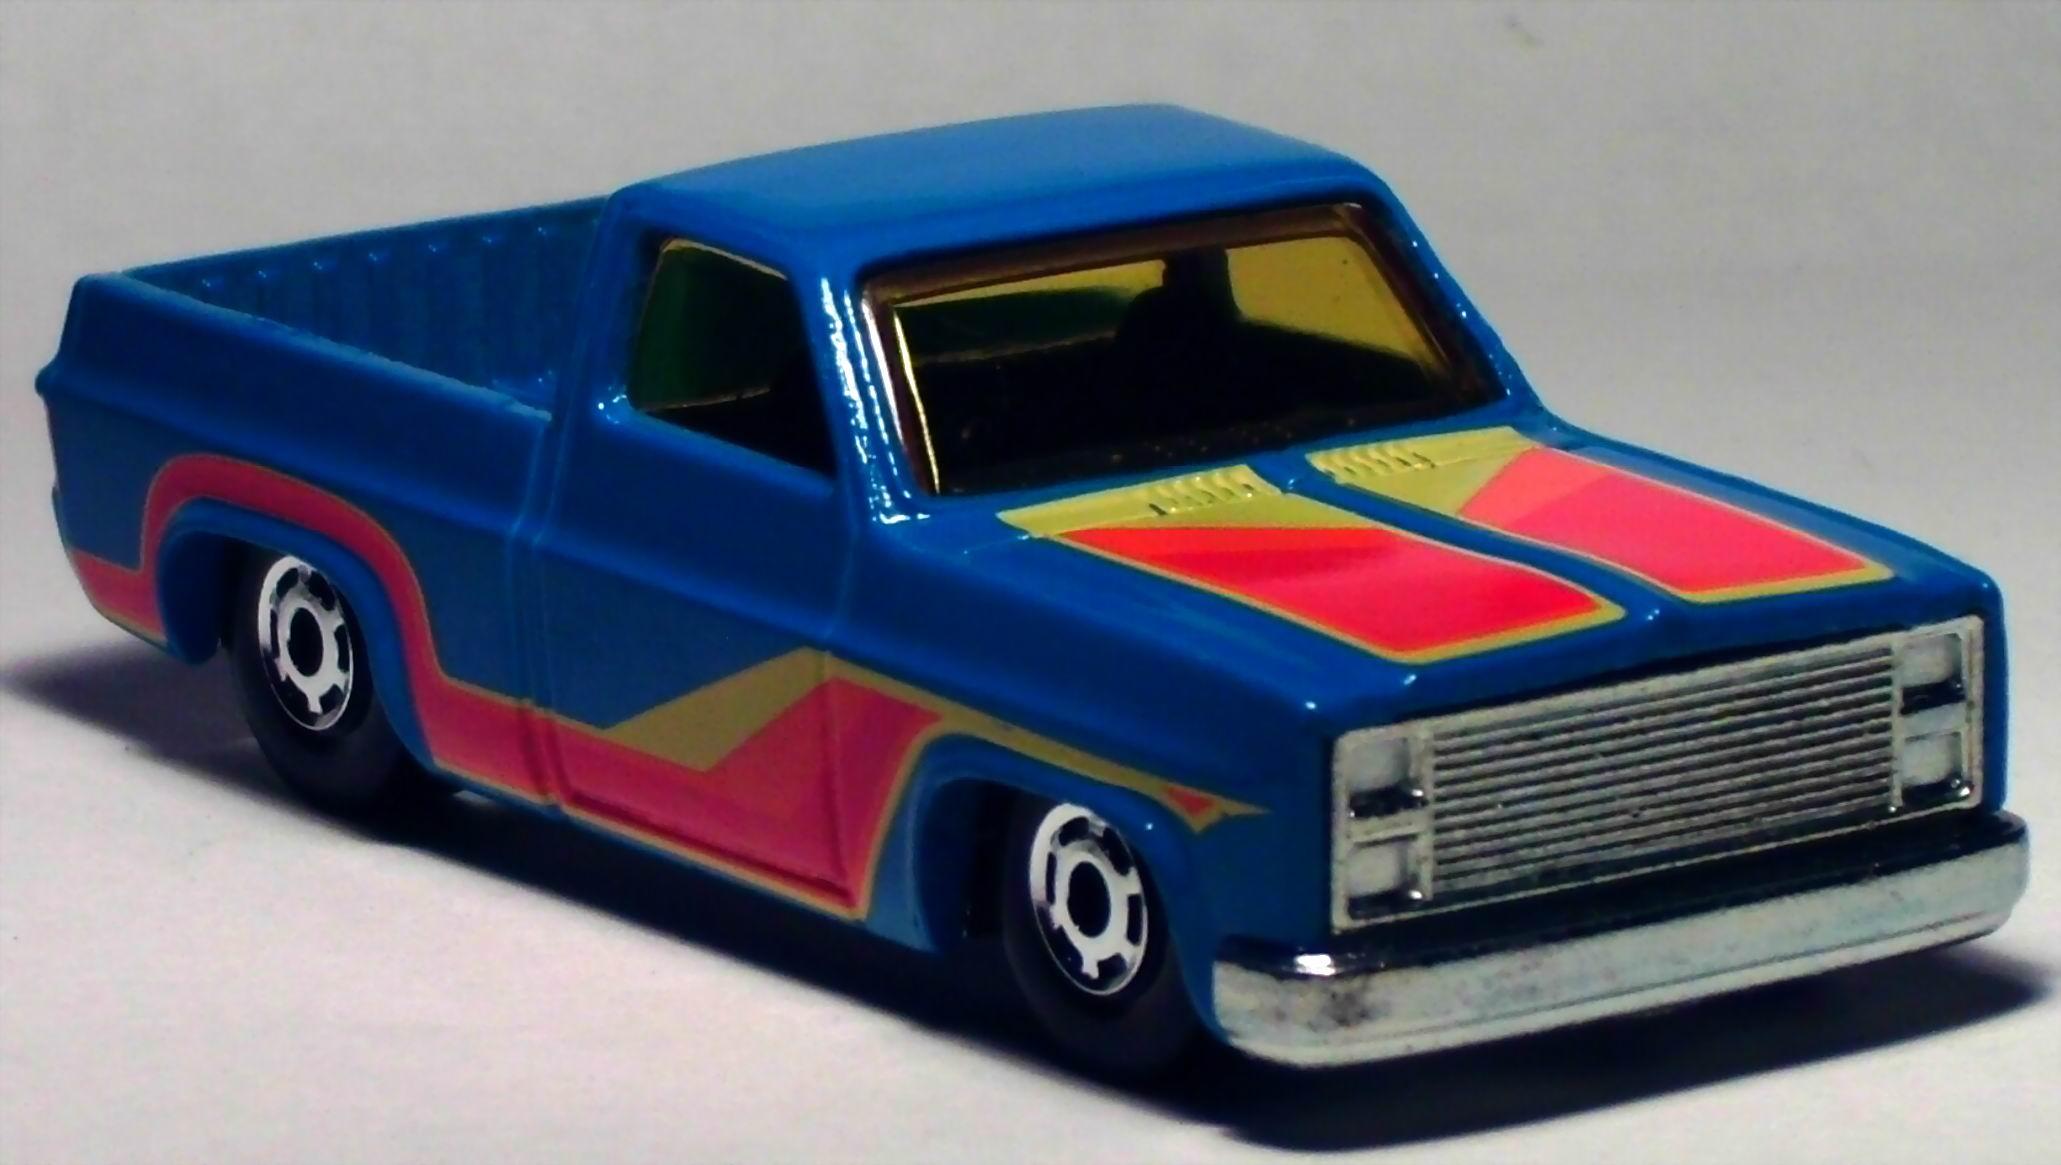 '83 Chevy Silverado - Hot Wheels Wiki